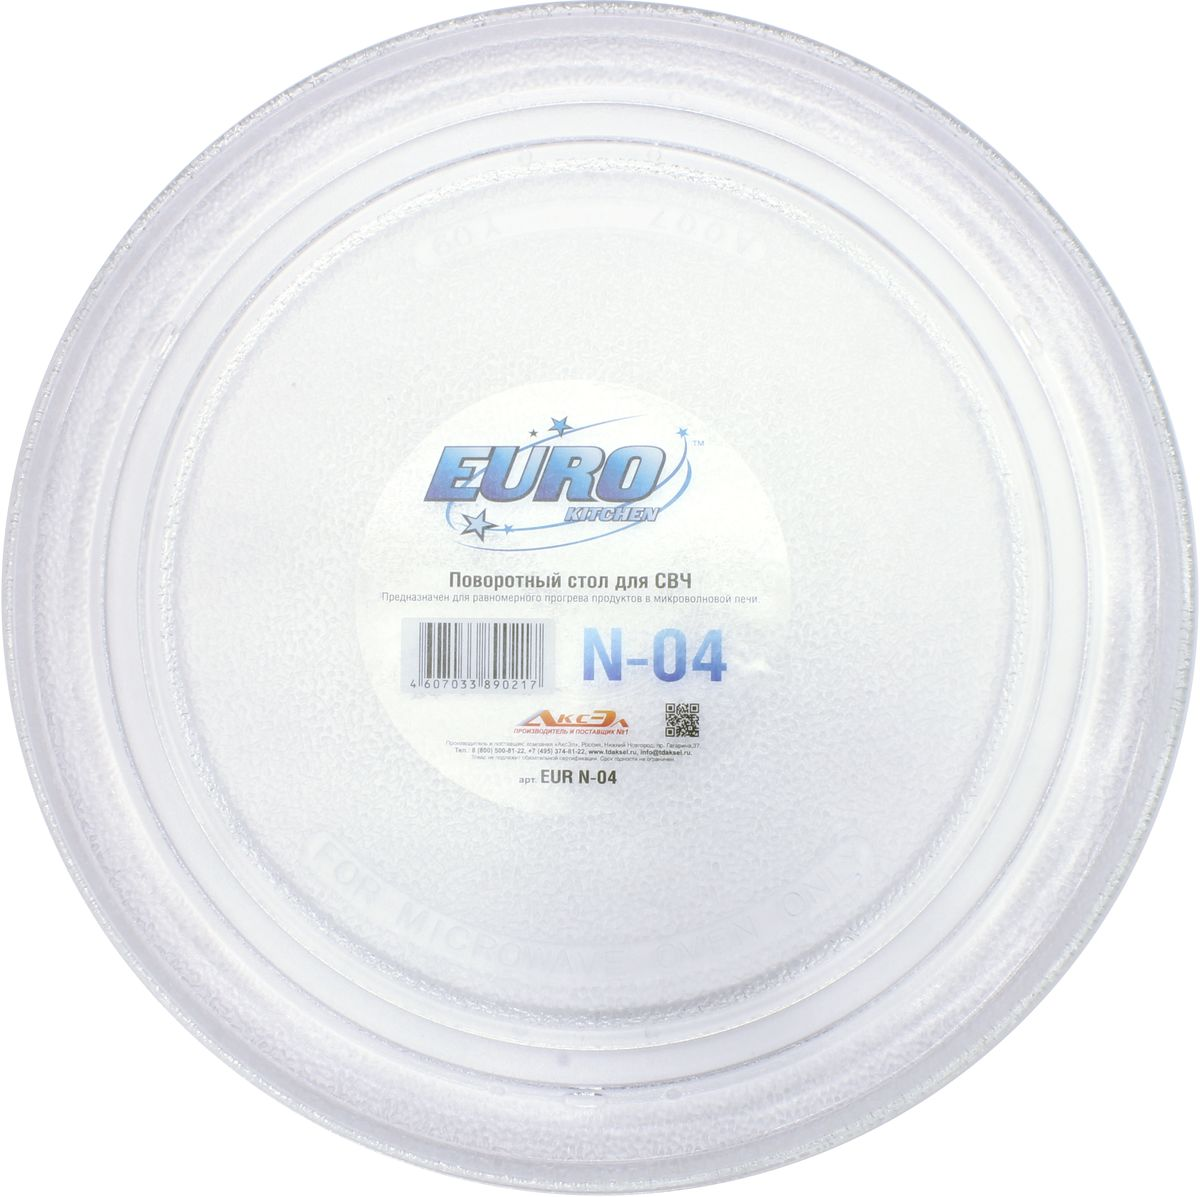 Euro Kitchen N-04 тарелка для СВЧN-04Универсальная тарелка N-04 для микроволновой печи с крестовиной. Диаметр тарелки 272 мм. Изготовлена из специального жаропрочногостекла. Предназначена для равномерного разогрева продуктов в микроволновой печиПодходит для брендов: Aeg, Airhot, Amica, Ardo, Ariston, Asko, Atlanta, Aurora, Ava, Barazza, Bauknecht, Bbk, Beko, Bomann, Bork, Bosch, Brandt, Candy, Cata, Centek, Clatronic,Daewoo, De dietrich, Delfa, Electrolux, Elenberg, Ergo, Erisson, Eurotec, Fagor, Fimar, Foster, Franke, Fulgor, Fusion, Gaggenau, Gastrorag, Goldstar, Gorenje,Hankel, Hansa, Hilton, Horizont, Hurakan, Hyundai, Ilve, Indesit, Kaiser, Kenmore, Kenwood, Korting, Kuppersberg, Kuppersbusch, Kamark, Keran, Lg, Liberton,Liberty, Maxwell, Menumaster, Midea, Miele, Moulinex, Mystery, Neff, Oursson, Panasonic, Proficook, Rainford, Redmond, Rolsen, Samsung, Saturn, Scarlett,Sencor, Sharp, Siemens, Simfer, Sinbo, Sirman, Smeg, Supra, Teka, Thomson, Toshiba, V-zug, Vasko, Vimar, Vitek, Vr, Weissgauff, West, Whirlpool, Zanussi,Zelmer, Zigmund&Shtain, Витязь, Рубин.